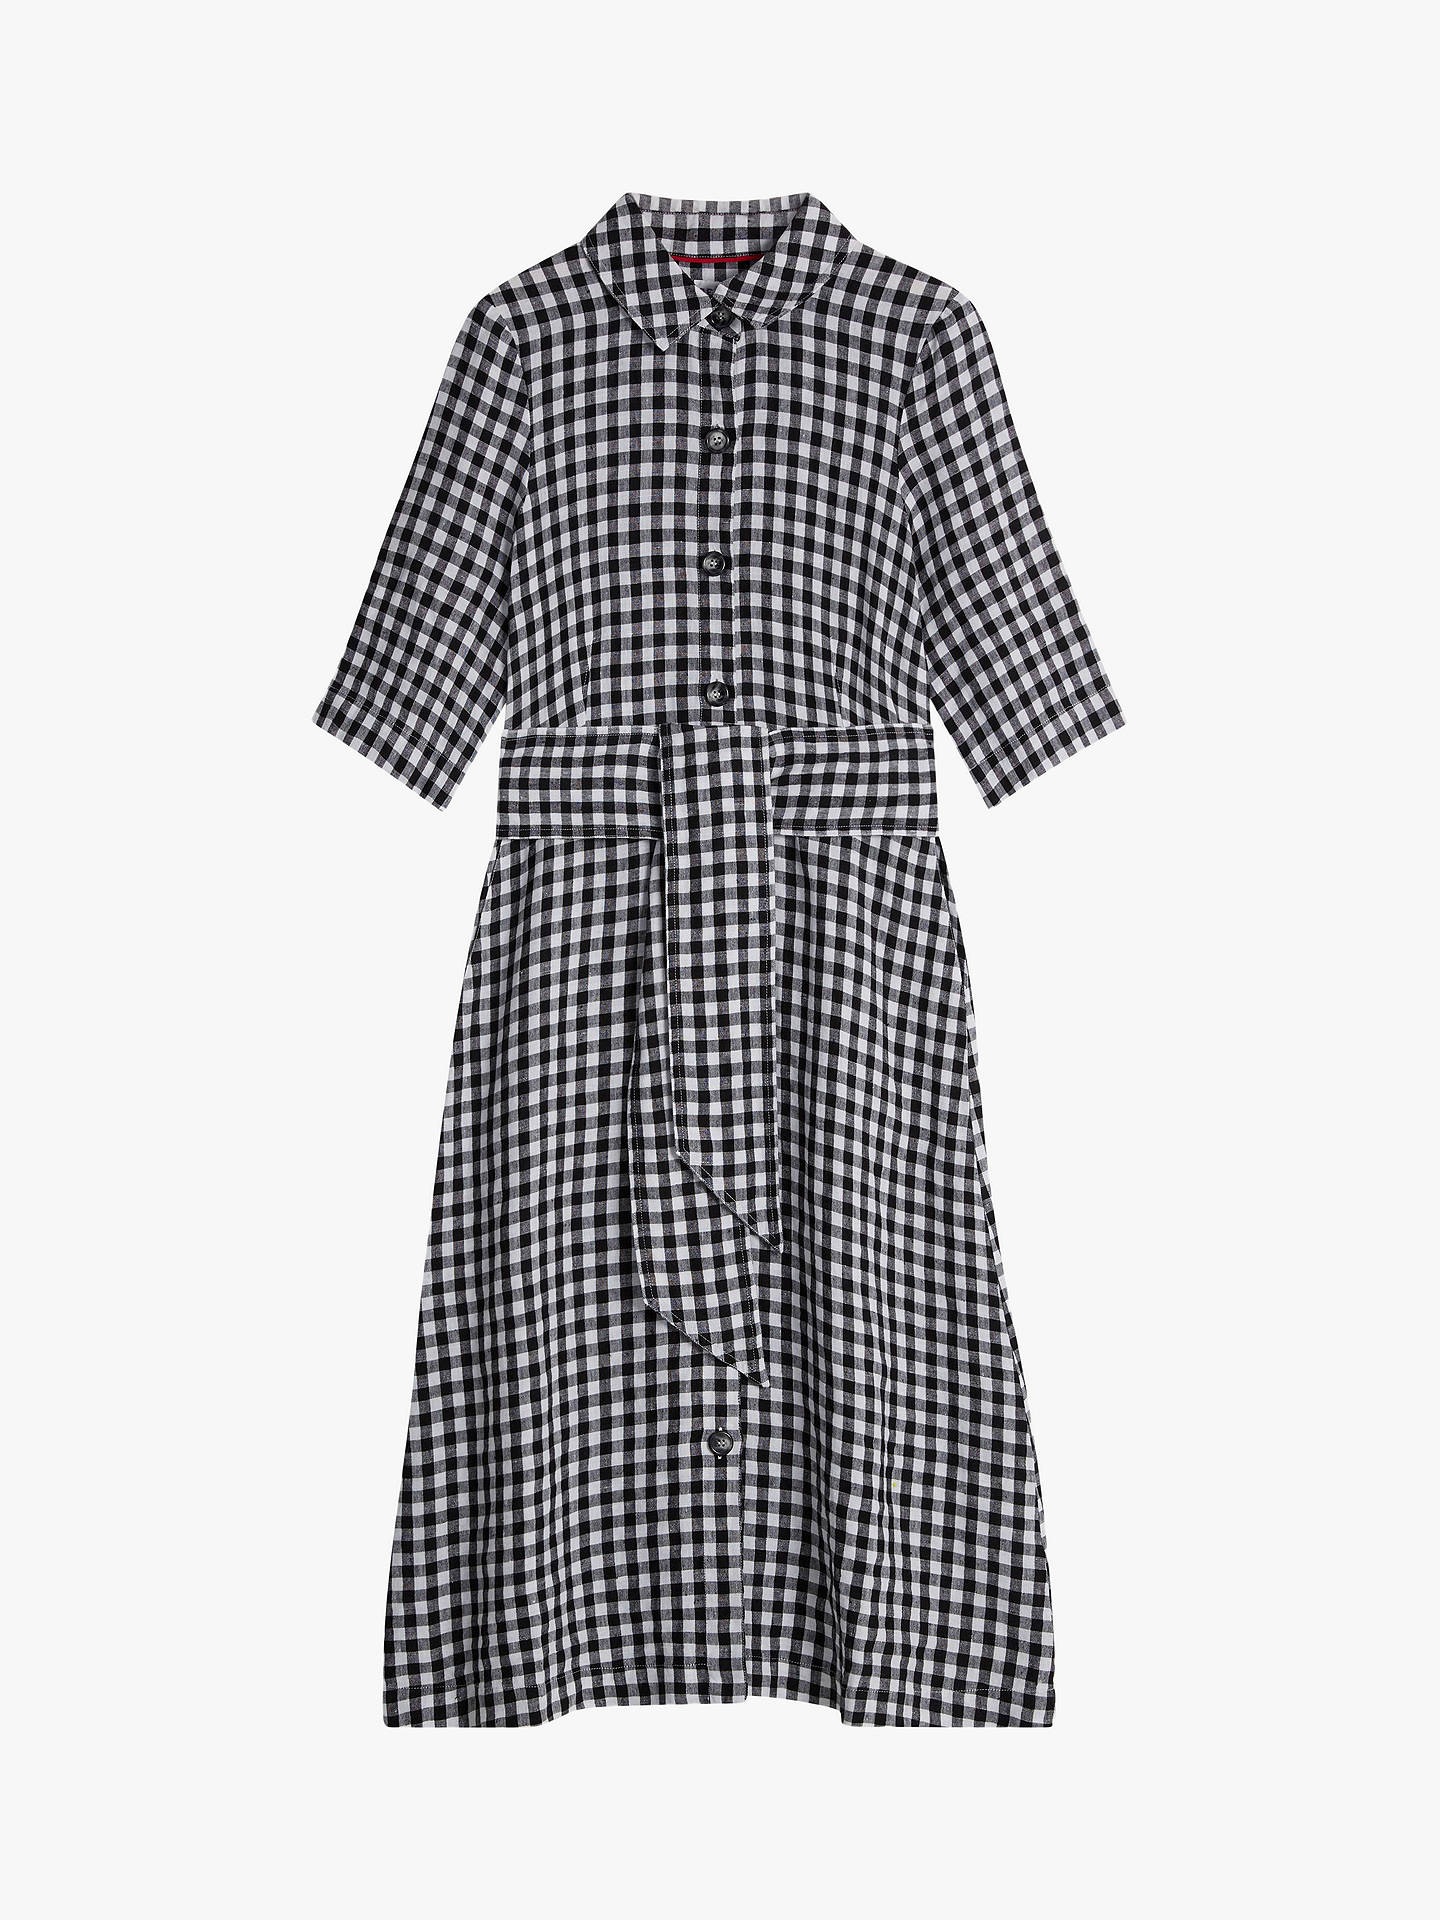 3d322621c2c ... Buy Brora Gingham Check Linen Shirt Dress